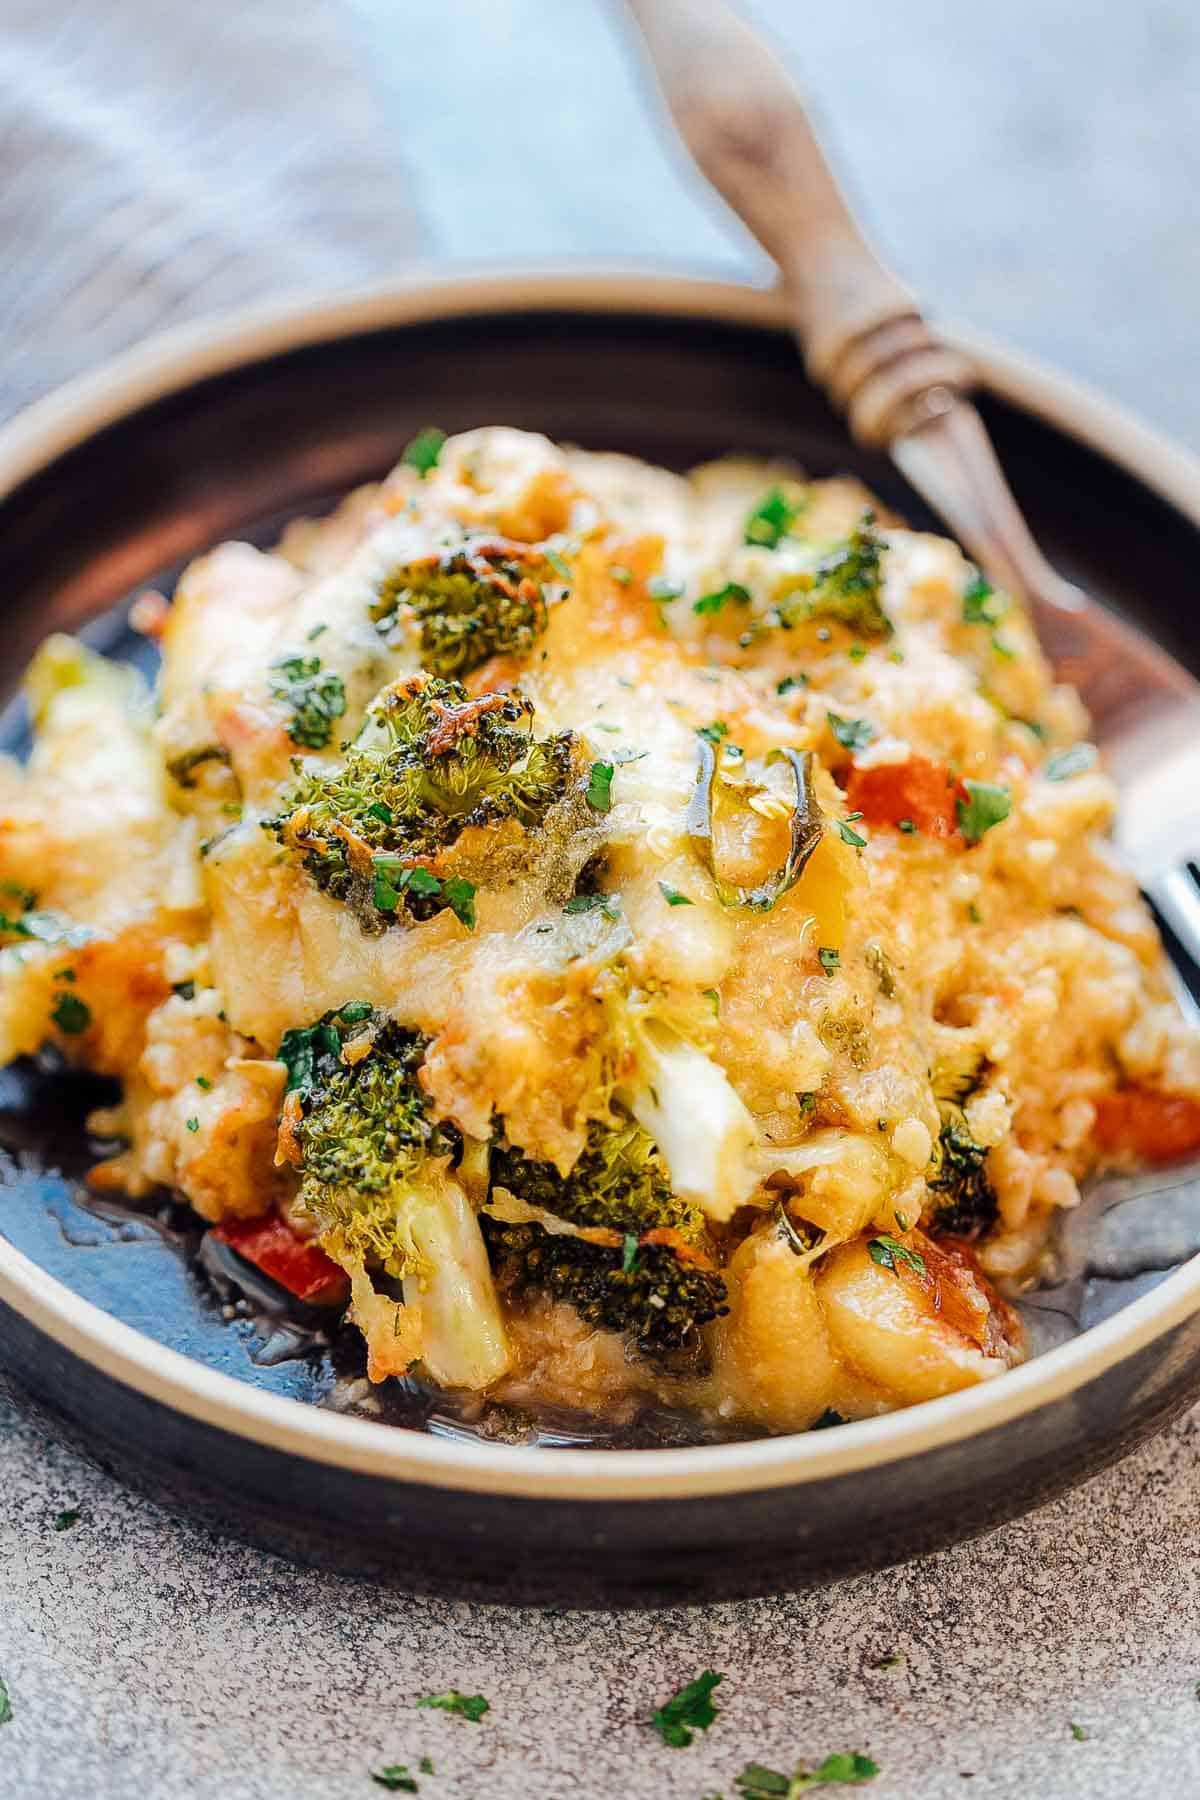 Broccoli Cauliflower Keto  Healthy Cauliflower Rice Broccoli Casserole Keto Gluten